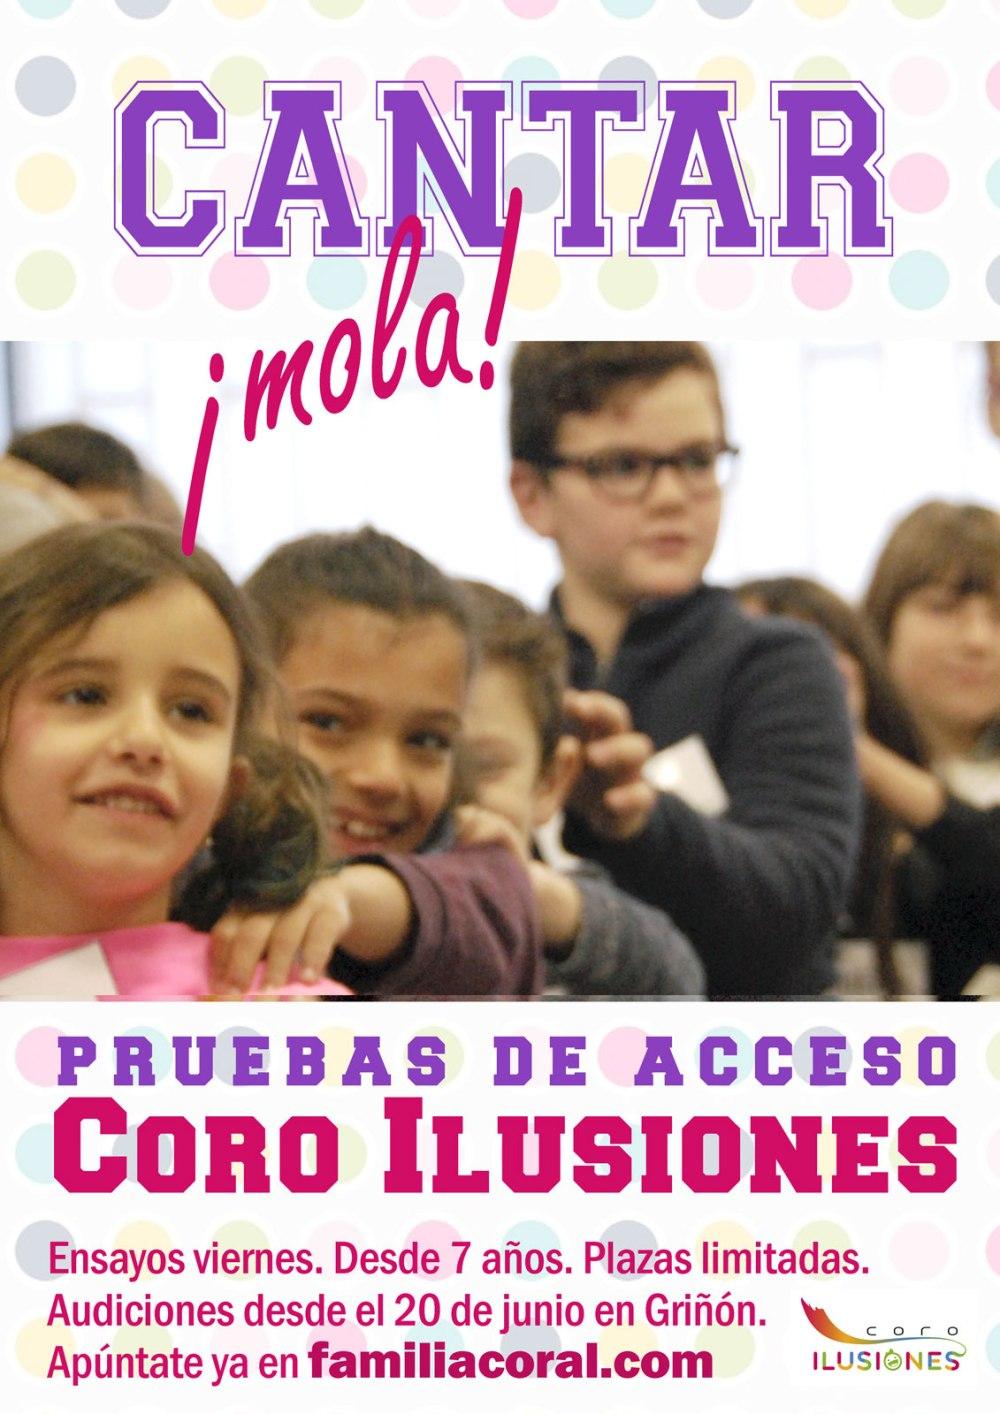 Cartel-Audiciones-jun18-v1-Ilusiones_low